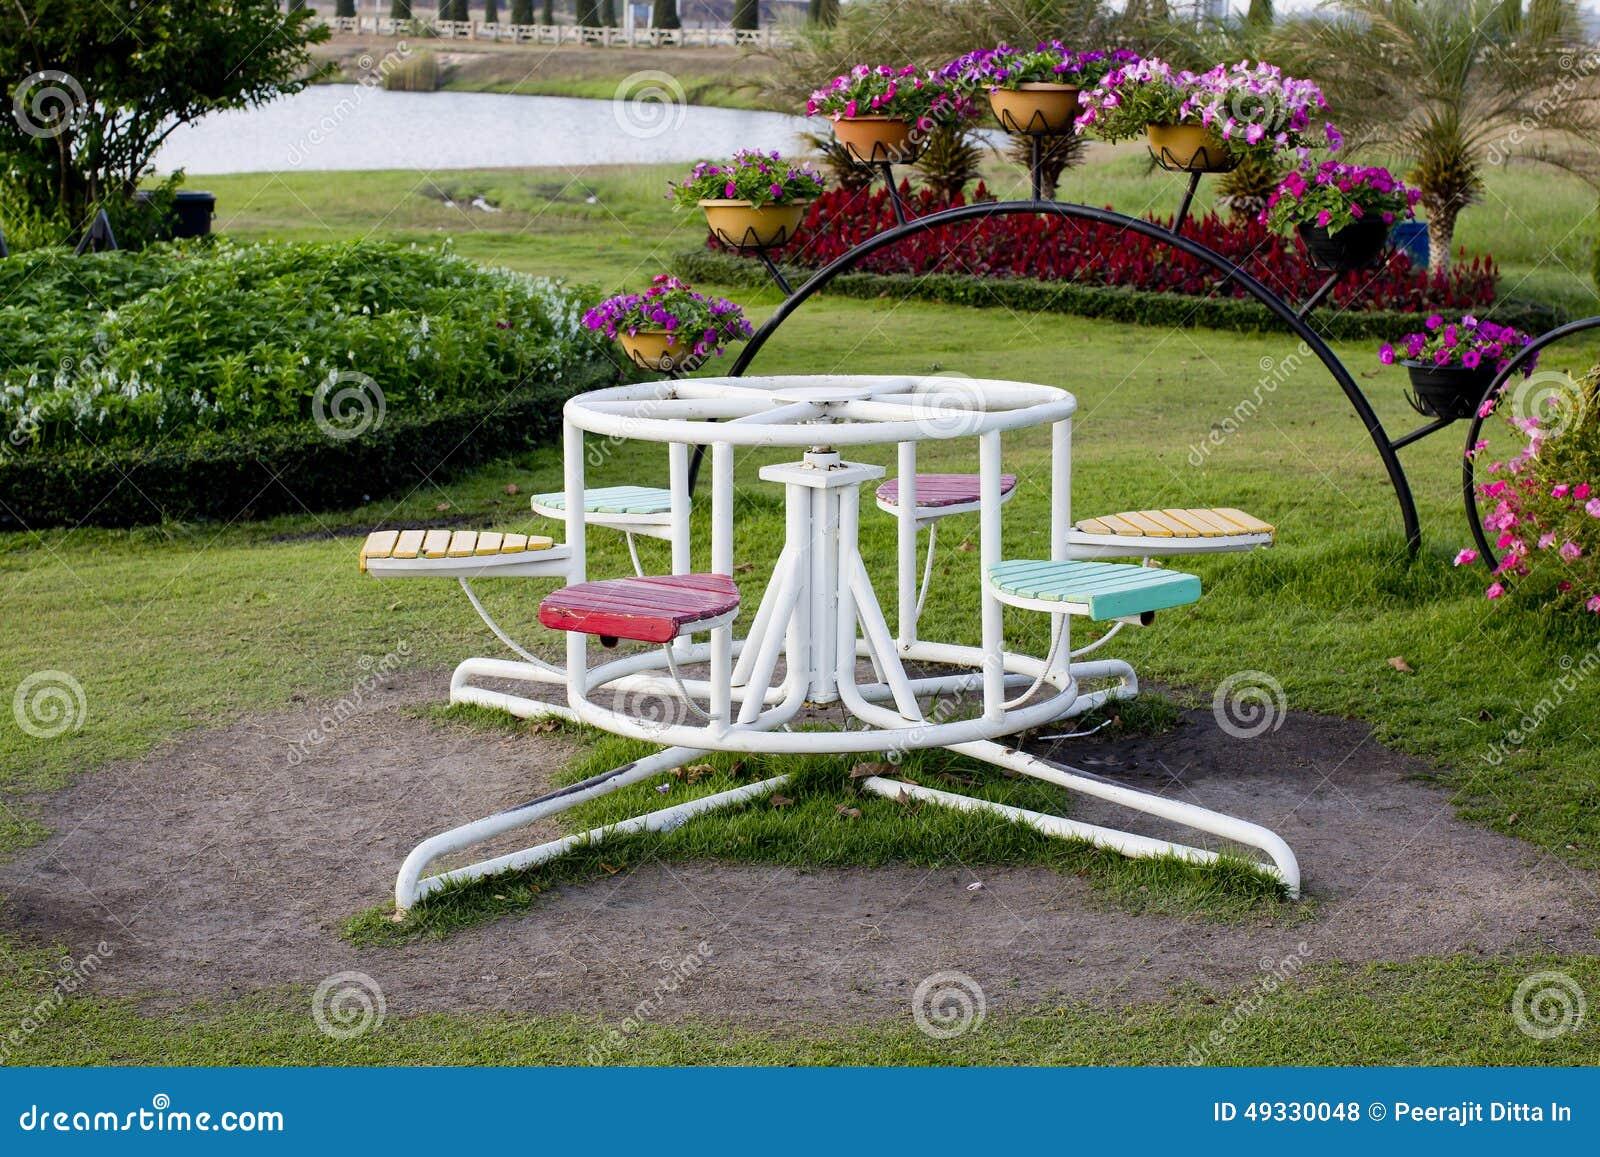 kinderkarussell im spielplatz stockfoto bild 49330048. Black Bedroom Furniture Sets. Home Design Ideas